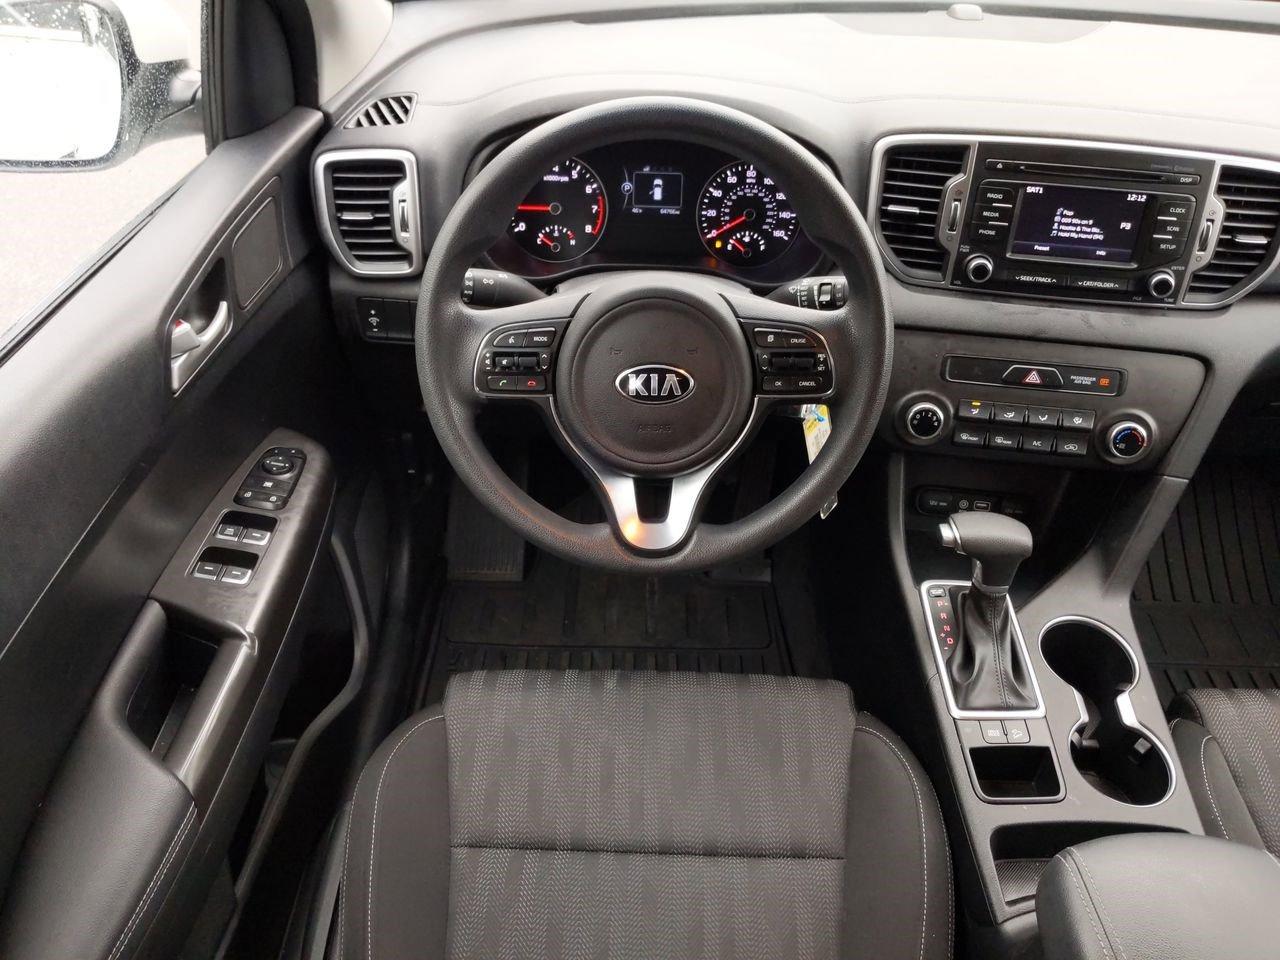 Pre-Owned 2017 Kia Sportage LX